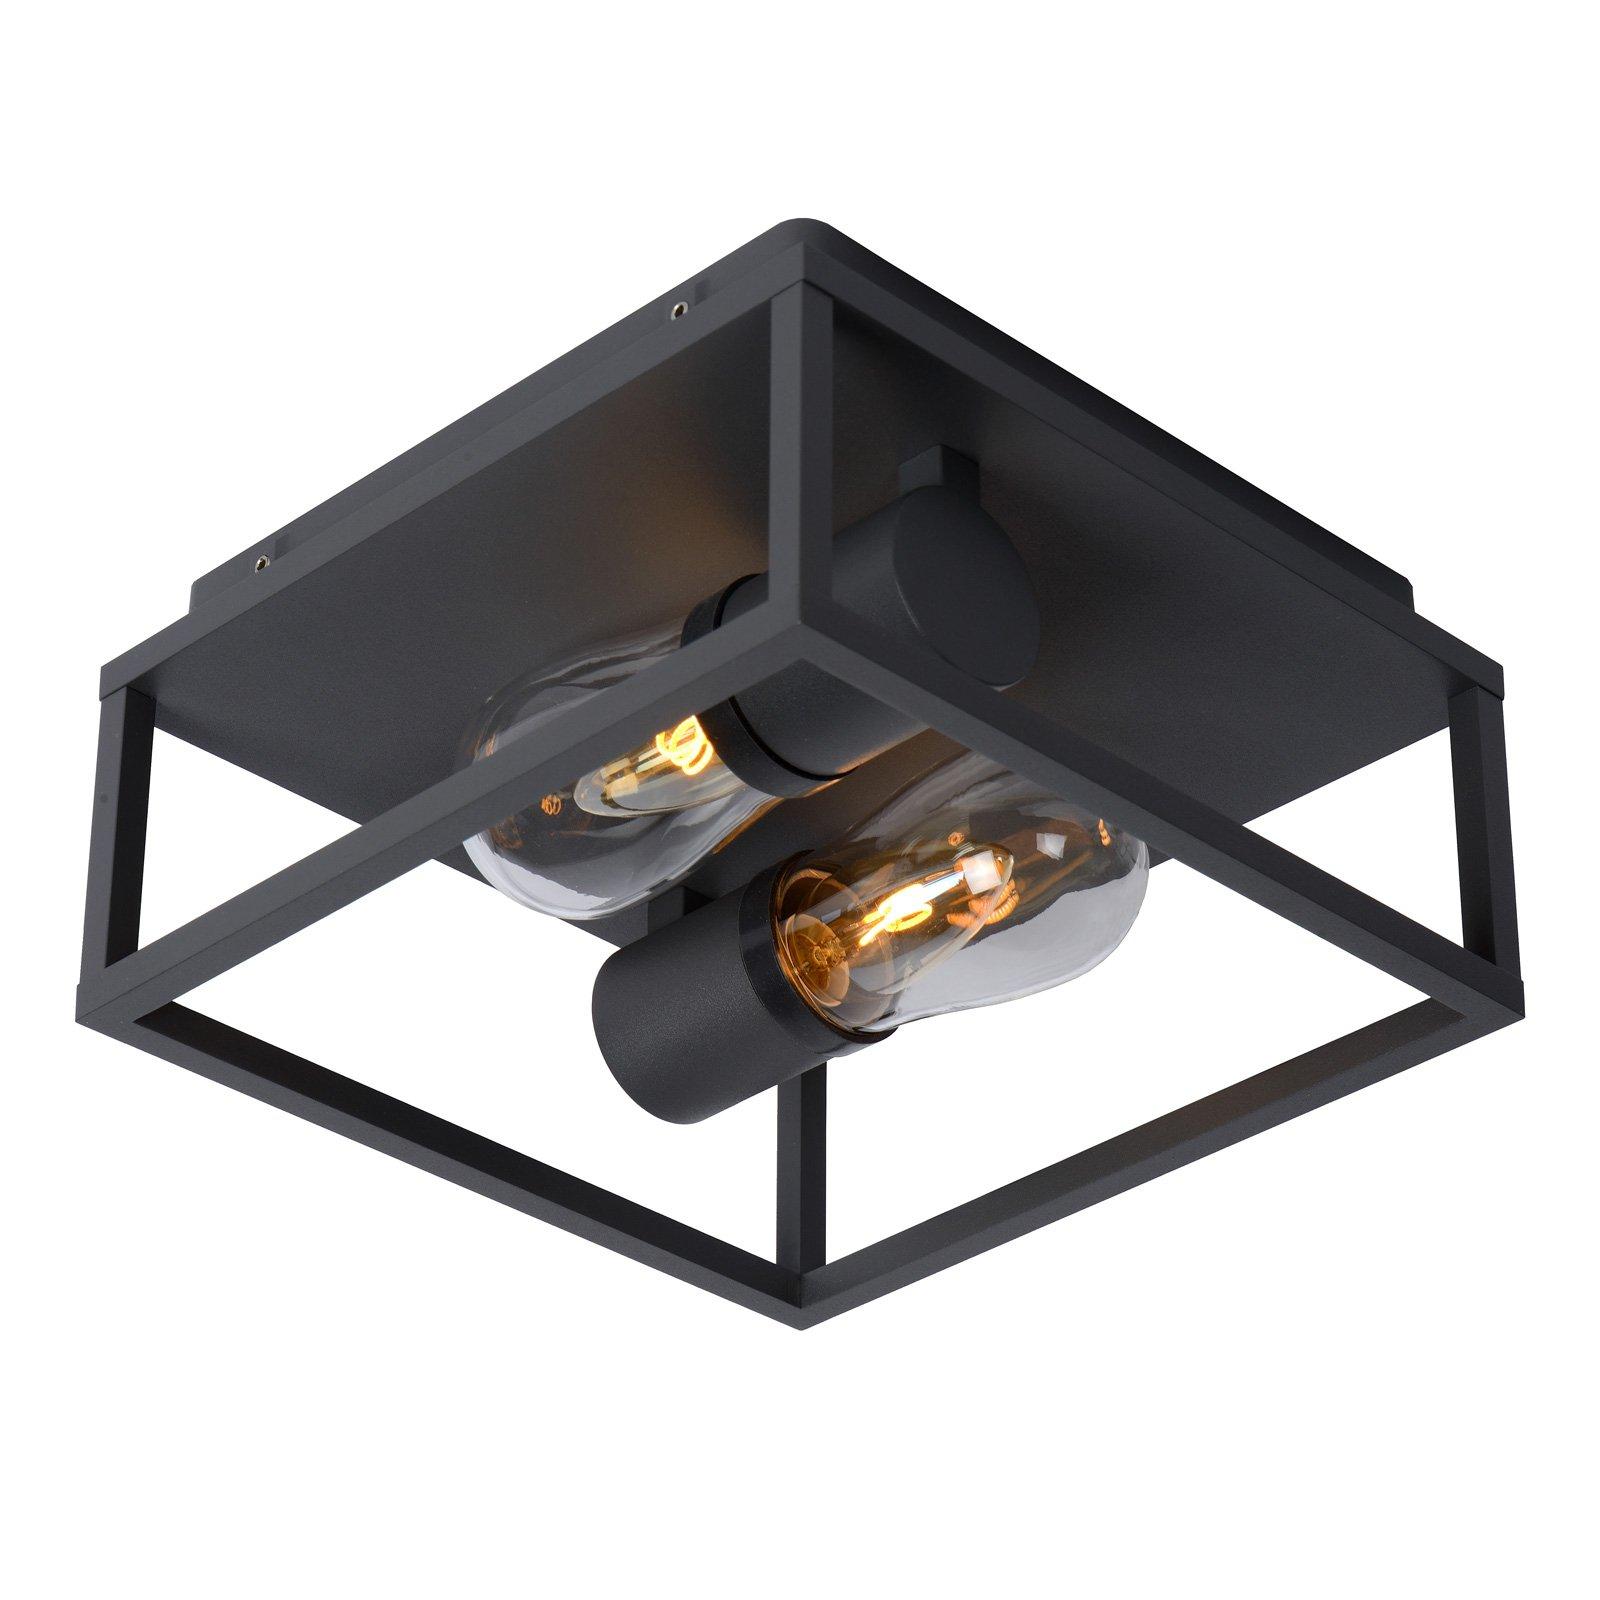 Taklampe Carlyn baderom 2 lyskilder svart